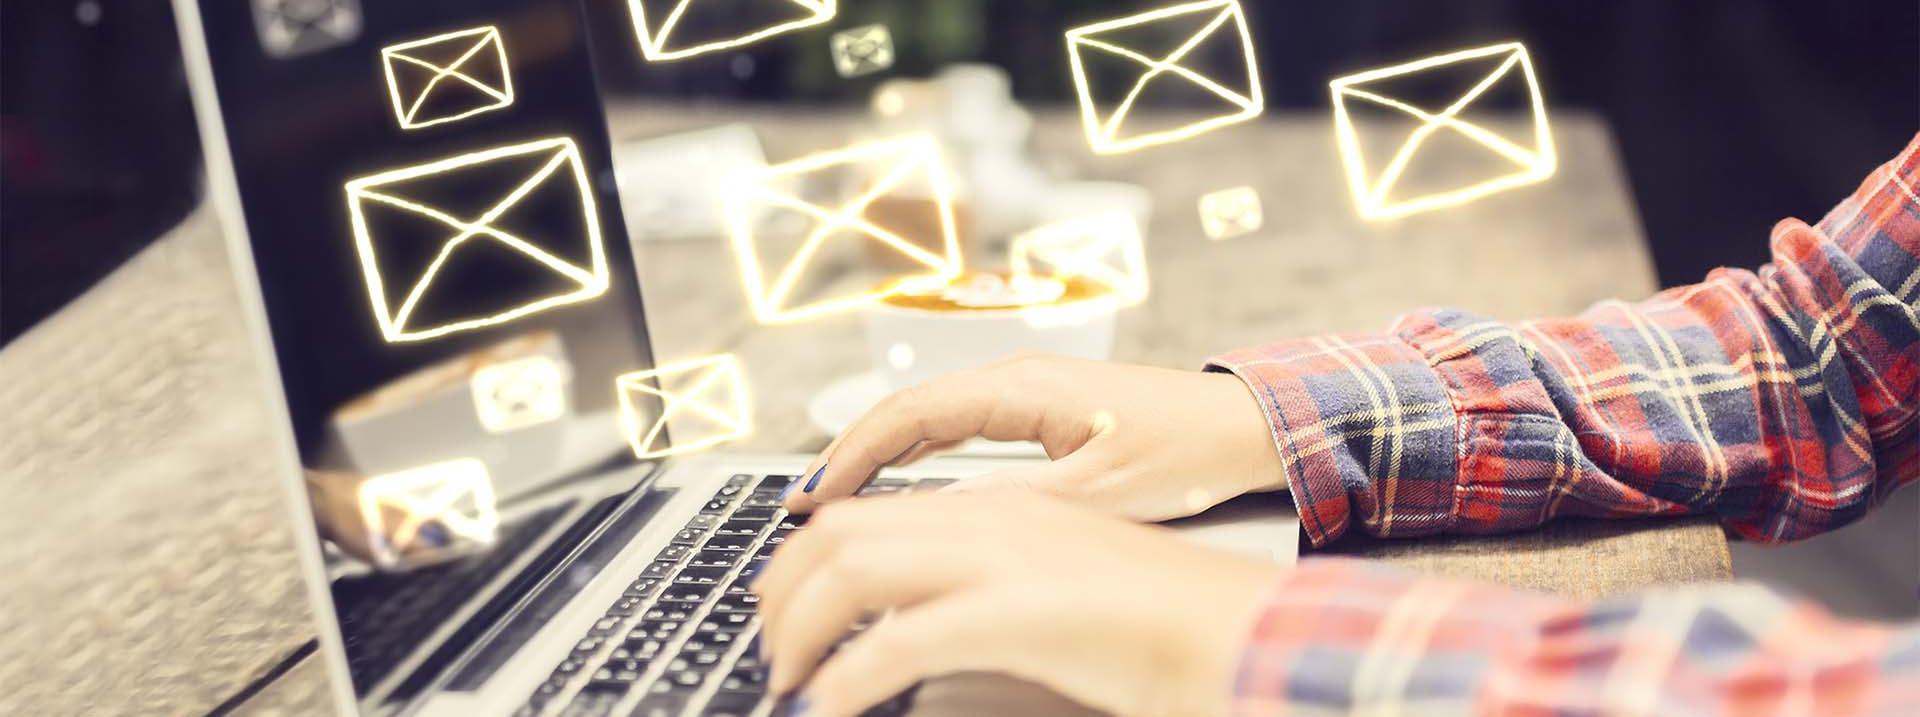 Social Media und E-Mail-Marketing